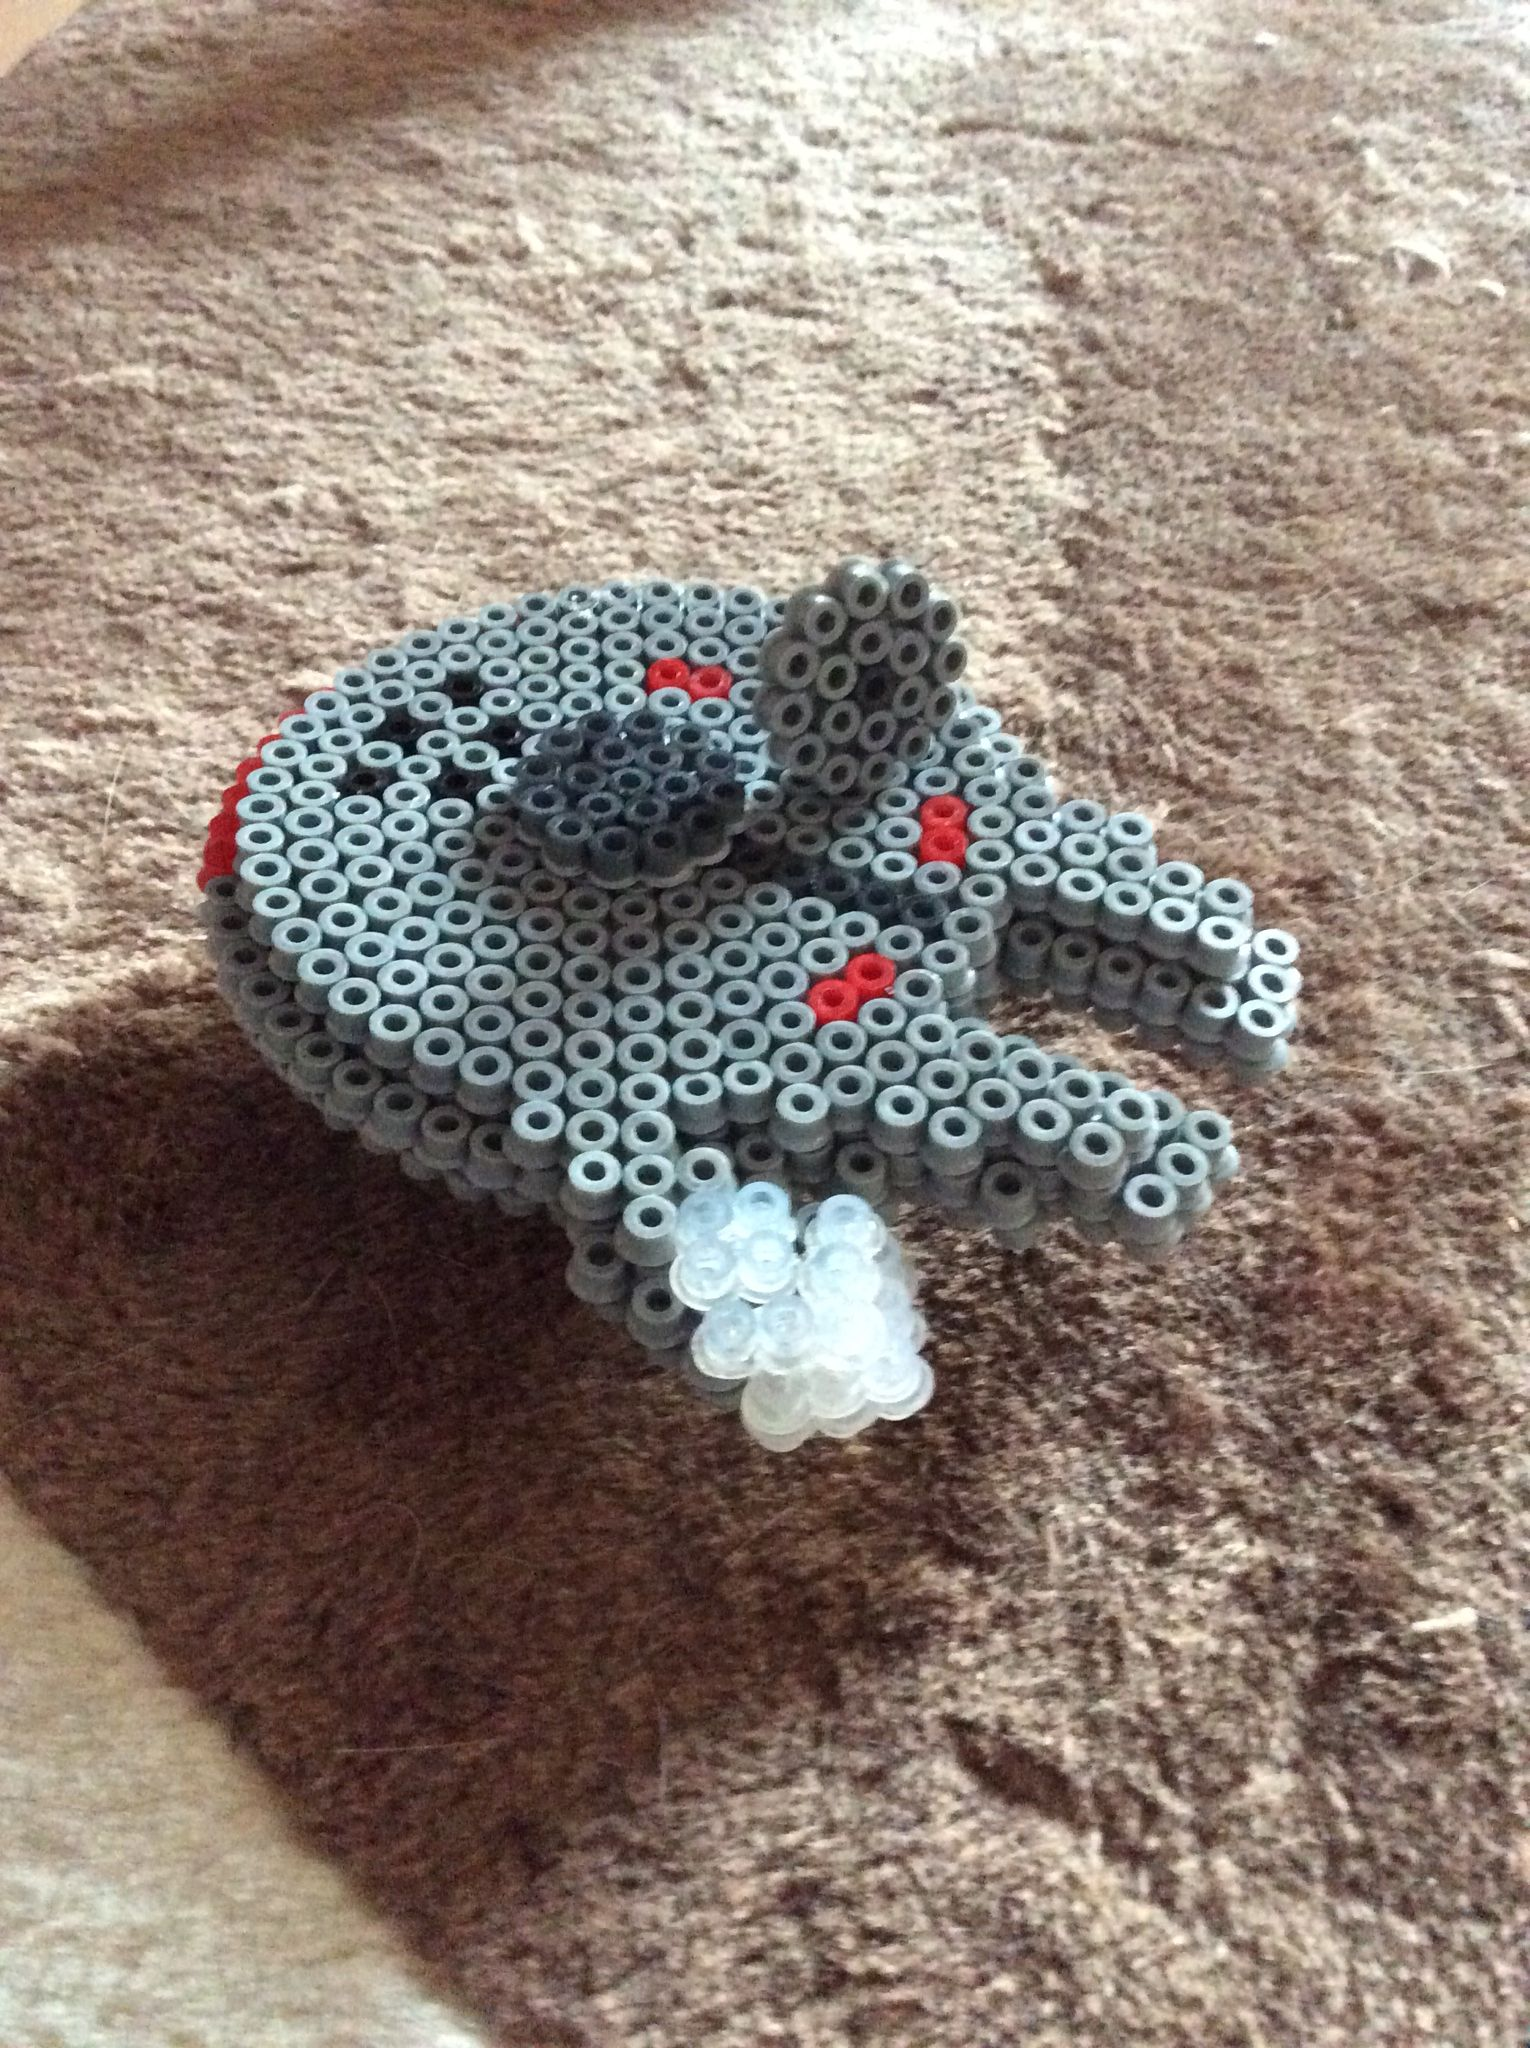 3D Star Wars Millennium Falcon hama beads by Mandy Norman | Hama ...